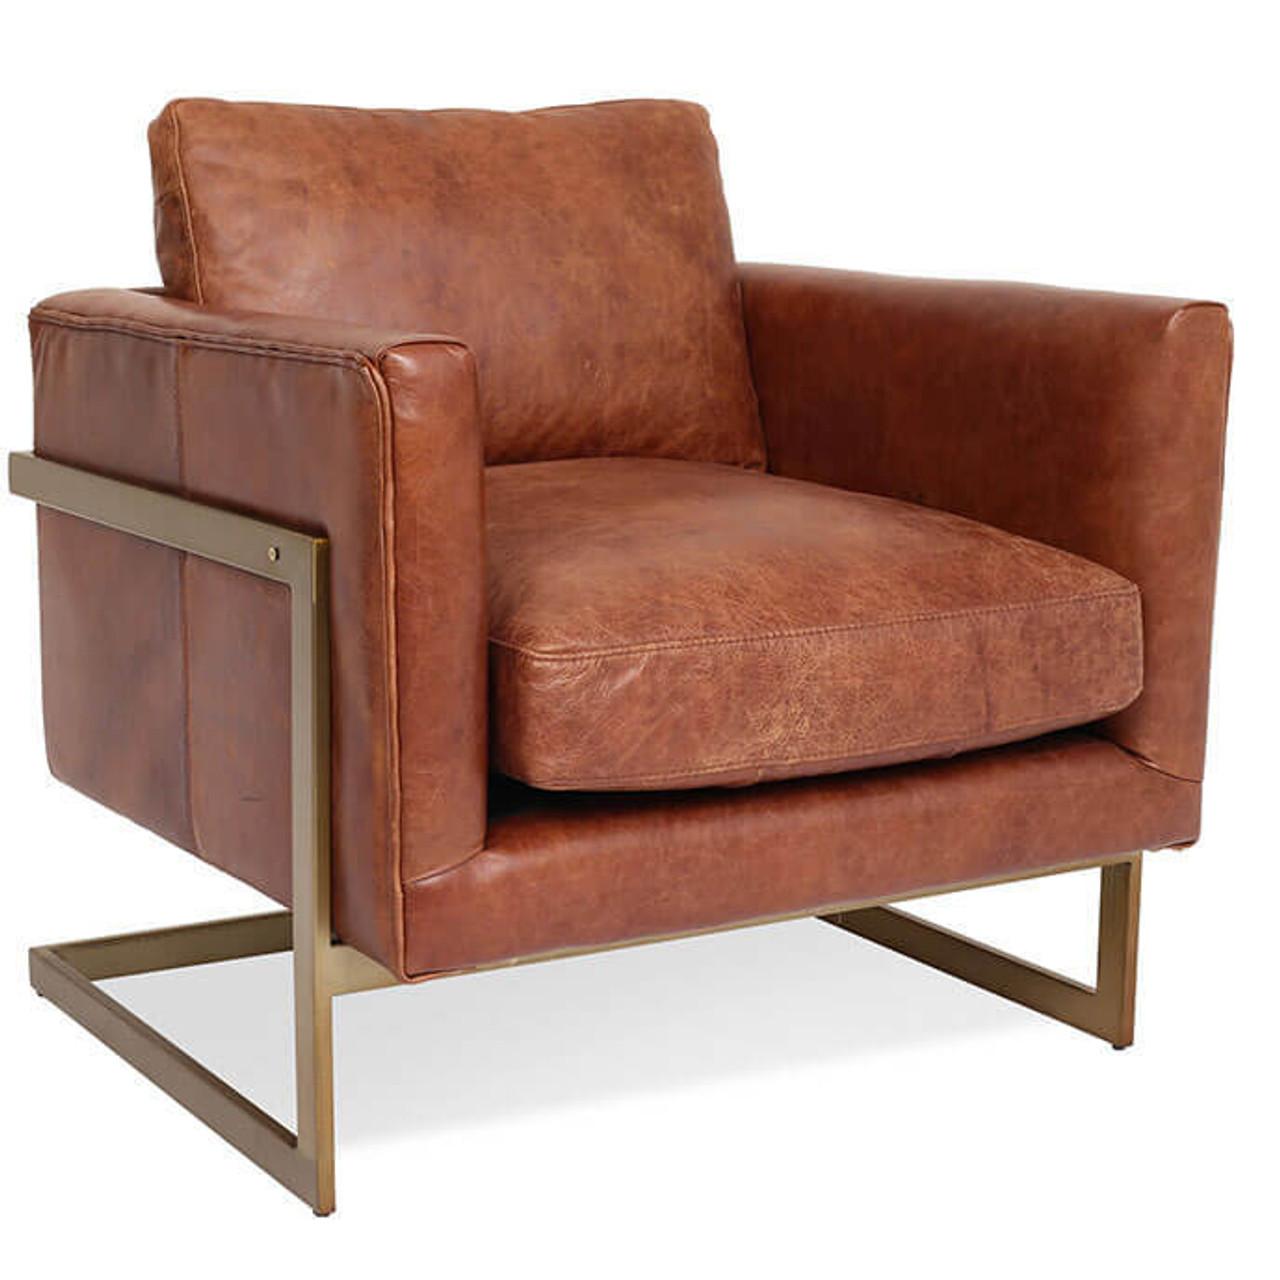 Genial London Modern Cognac Leather Club Chair